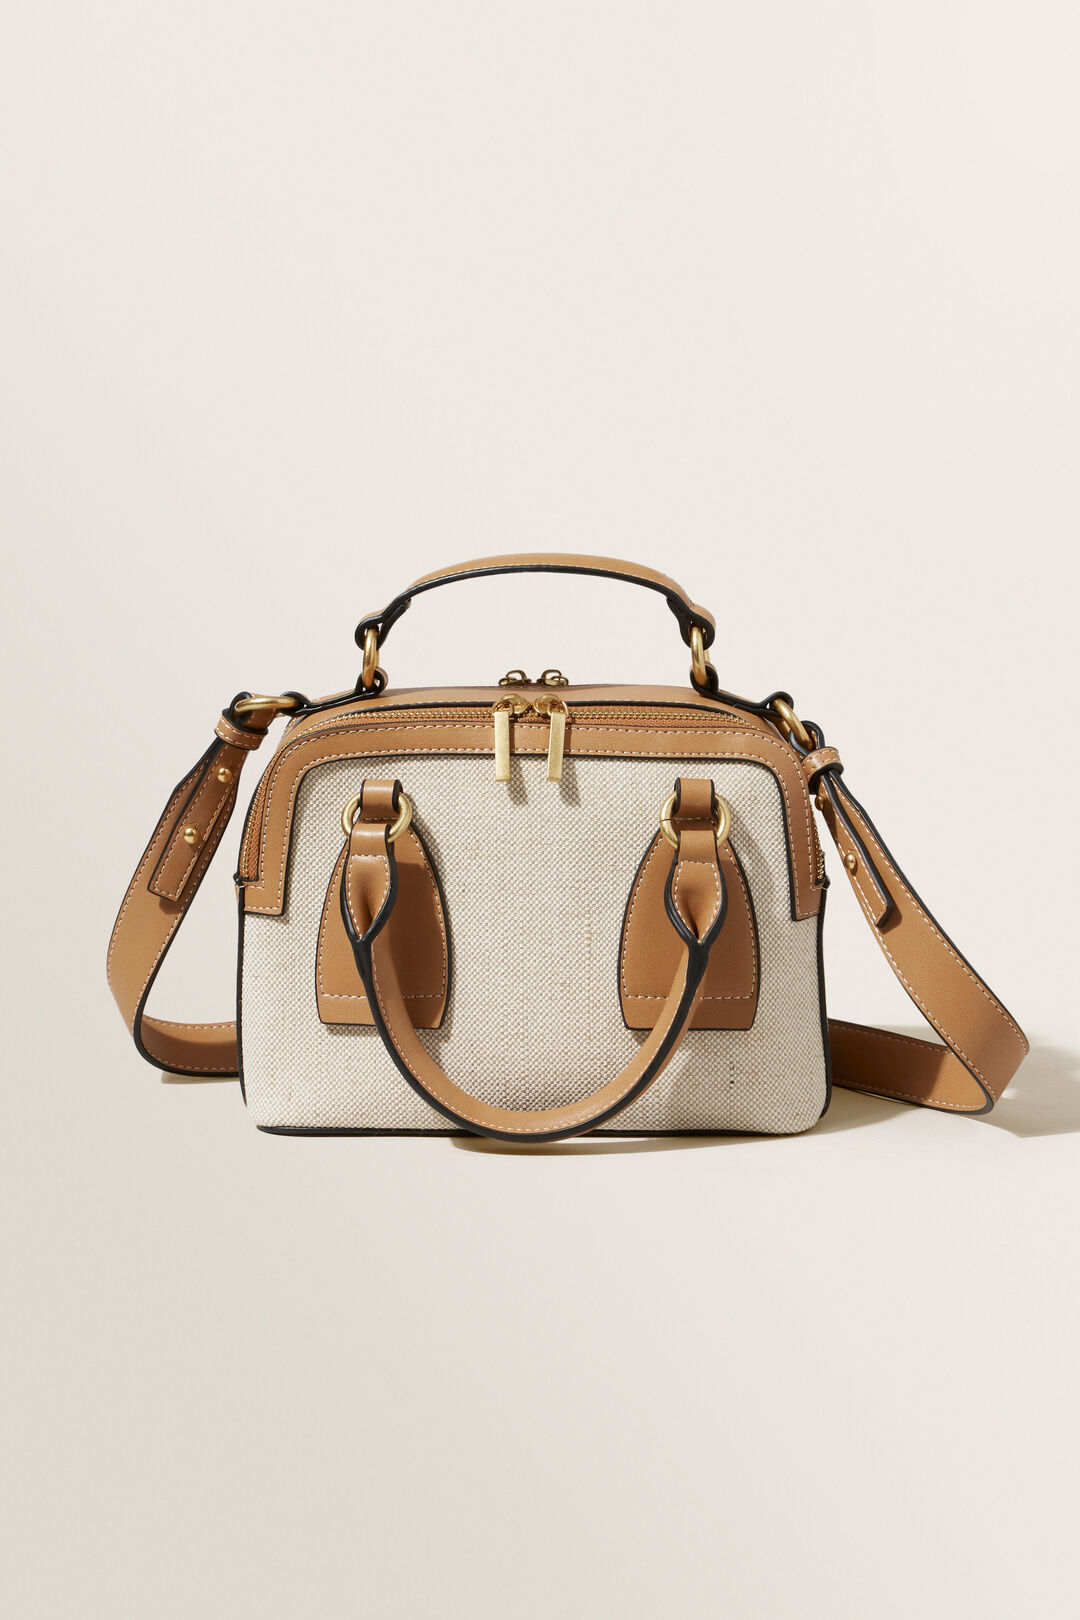 Textured Fabric Sling Bag  Honey Tan Natural  hi-res